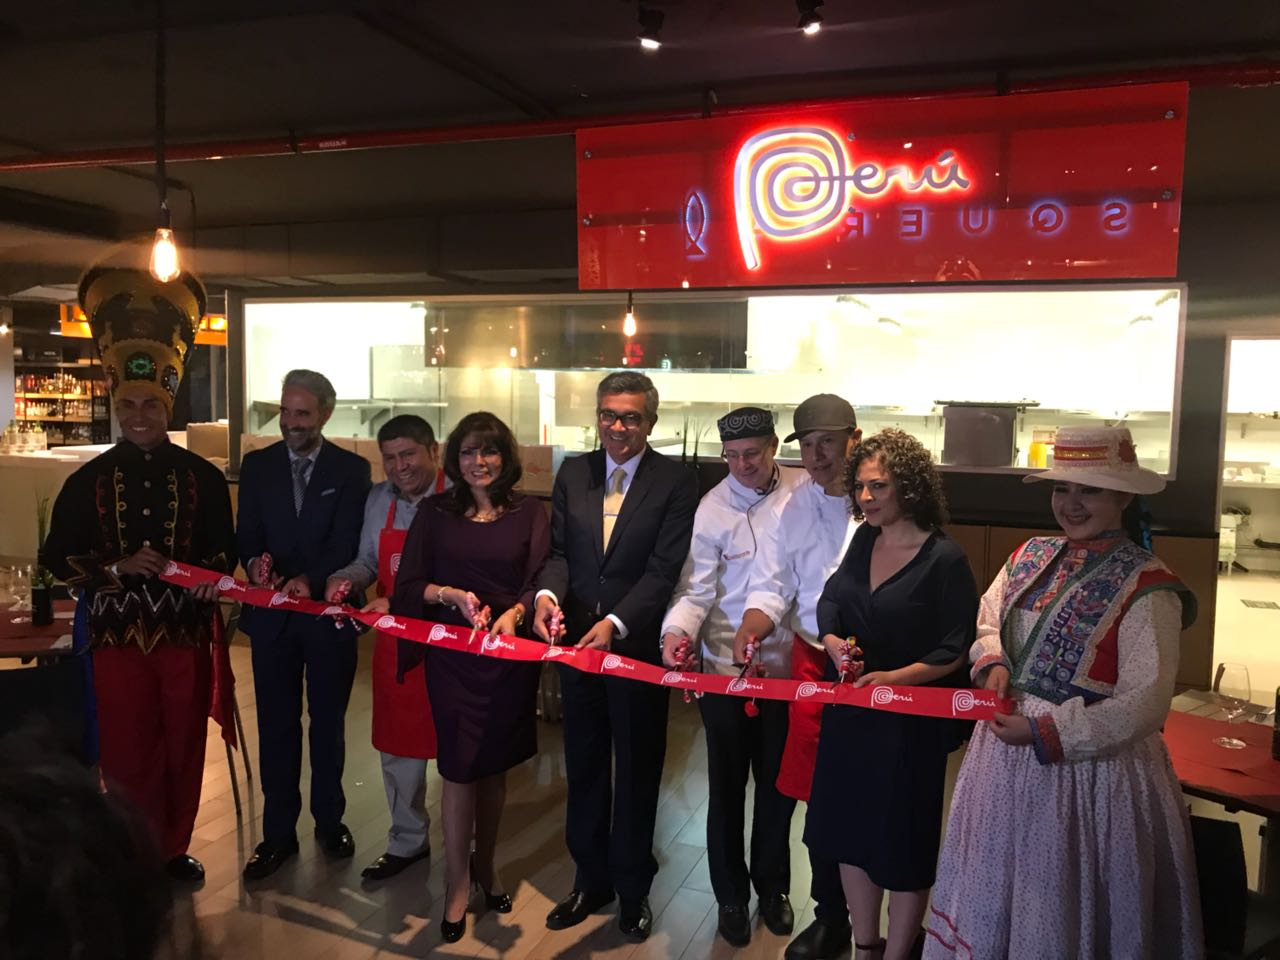 Liverpool supermercados - Liverpool abrió restaurante de gastronomía peruana en Polanco